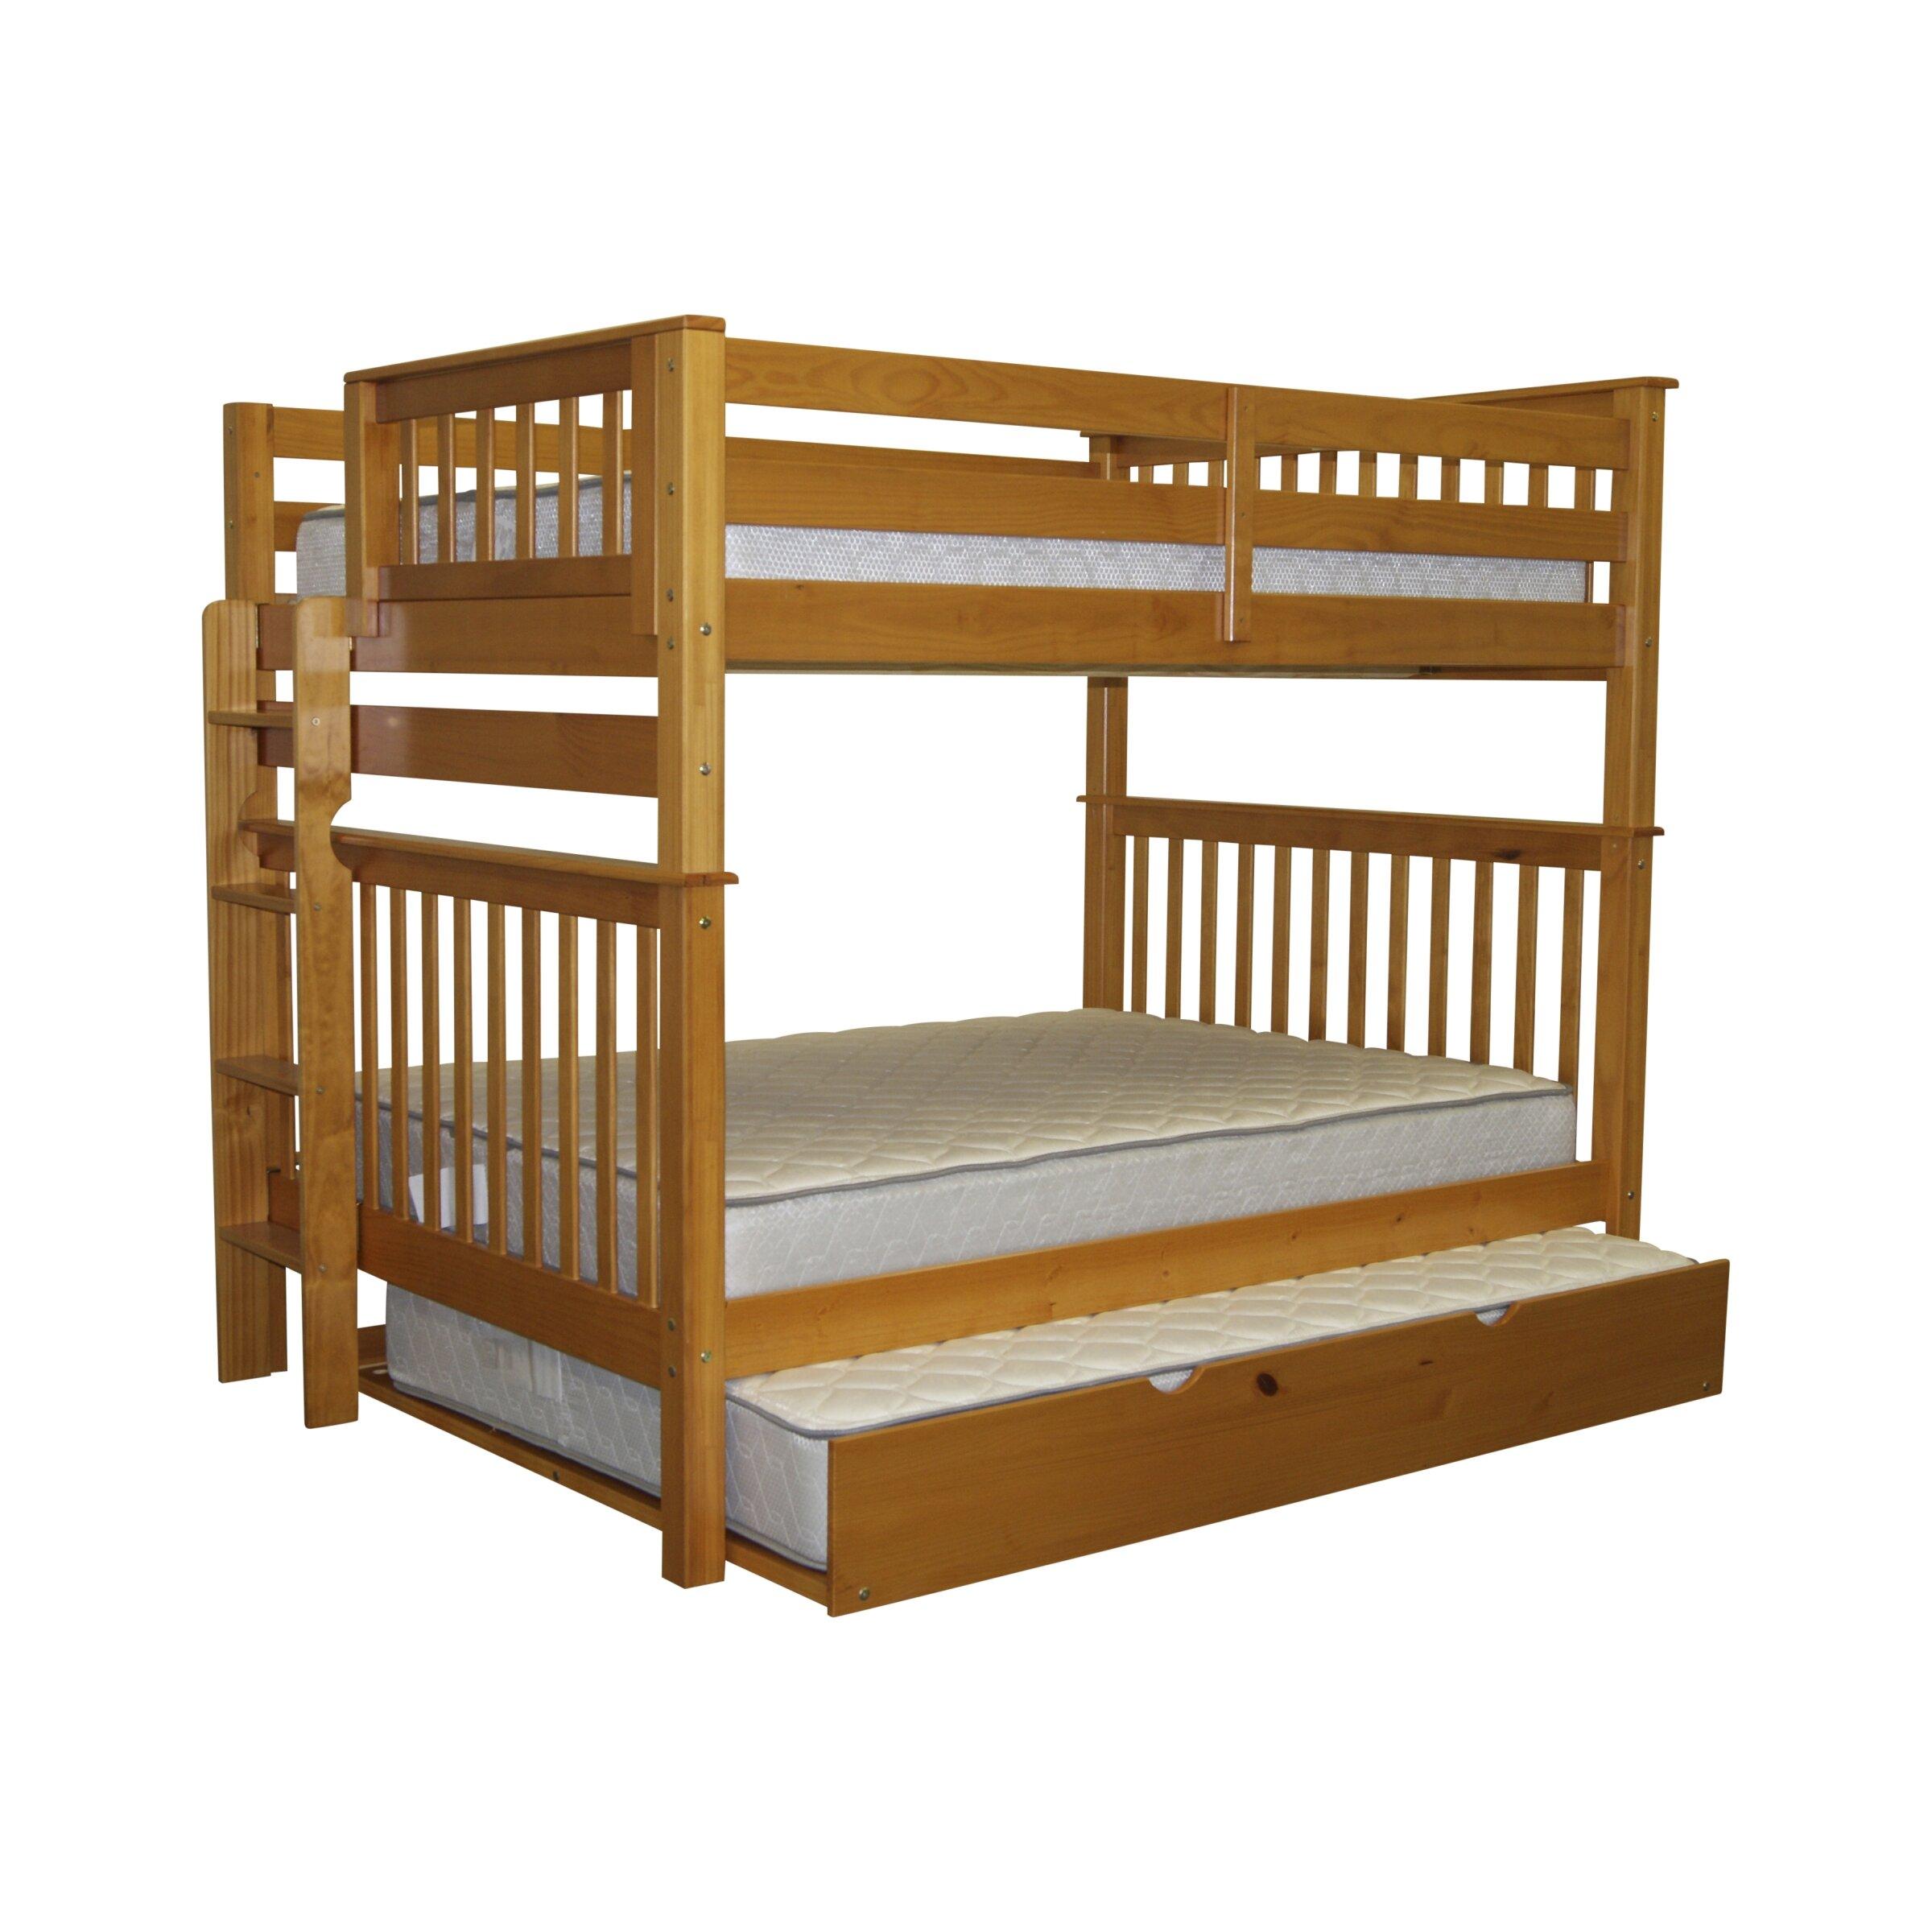 bedz king mission full over full bunk bed with trundle reviews wayfair. Black Bedroom Furniture Sets. Home Design Ideas